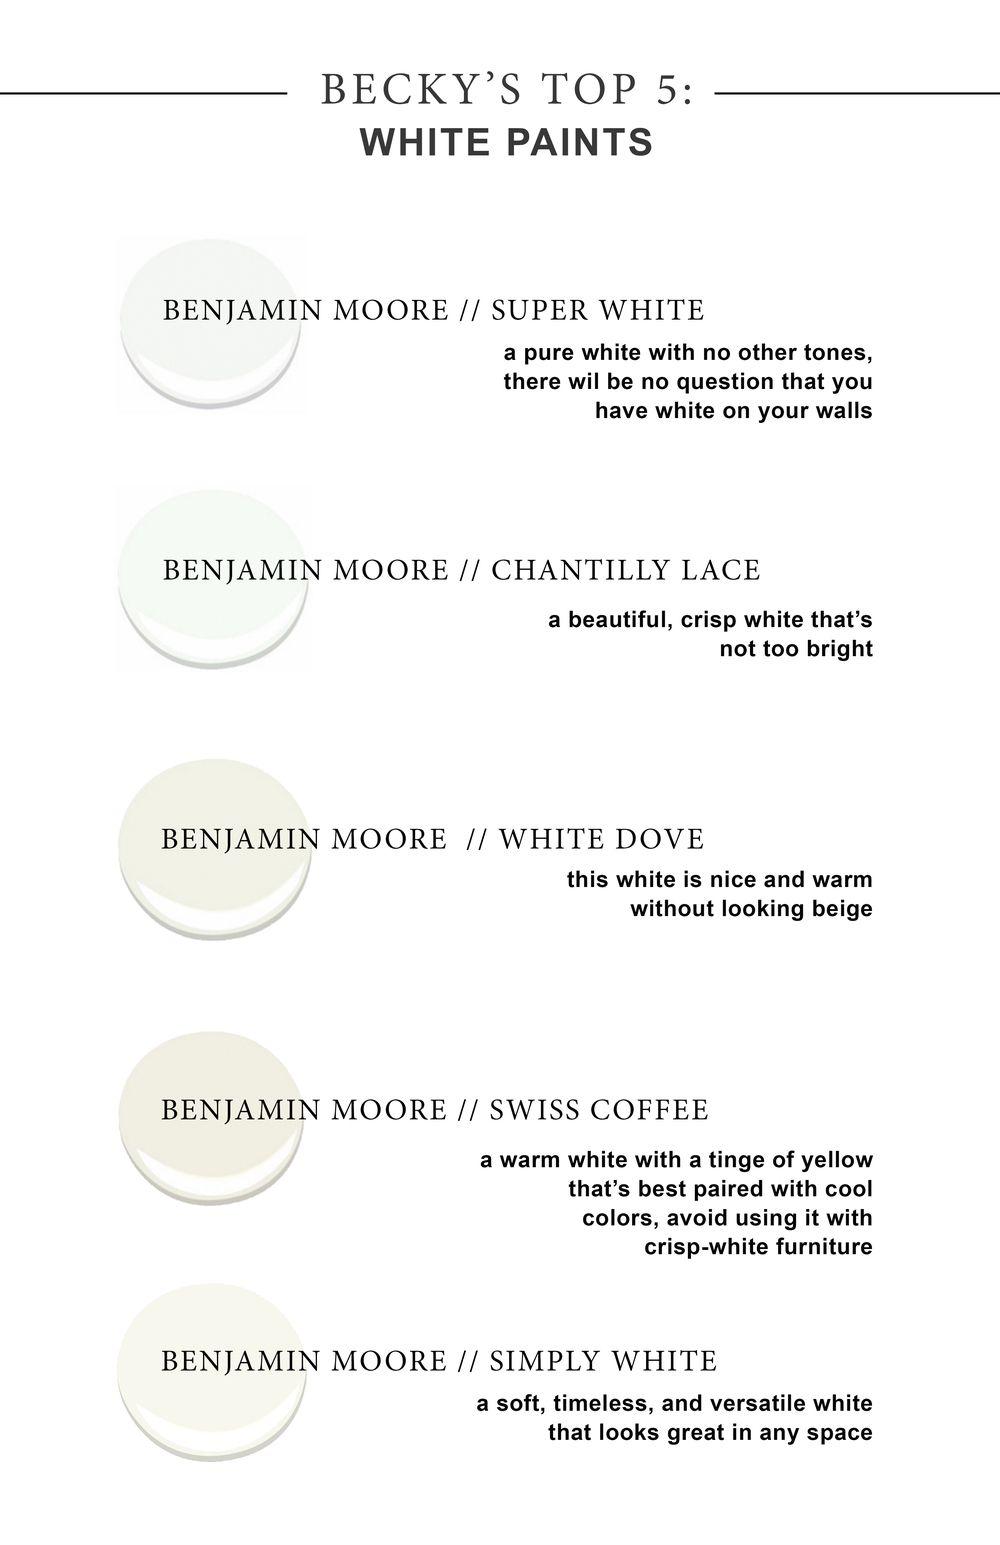 Becky's Top 5: White Paints #swisscoffeebenjaminmoore